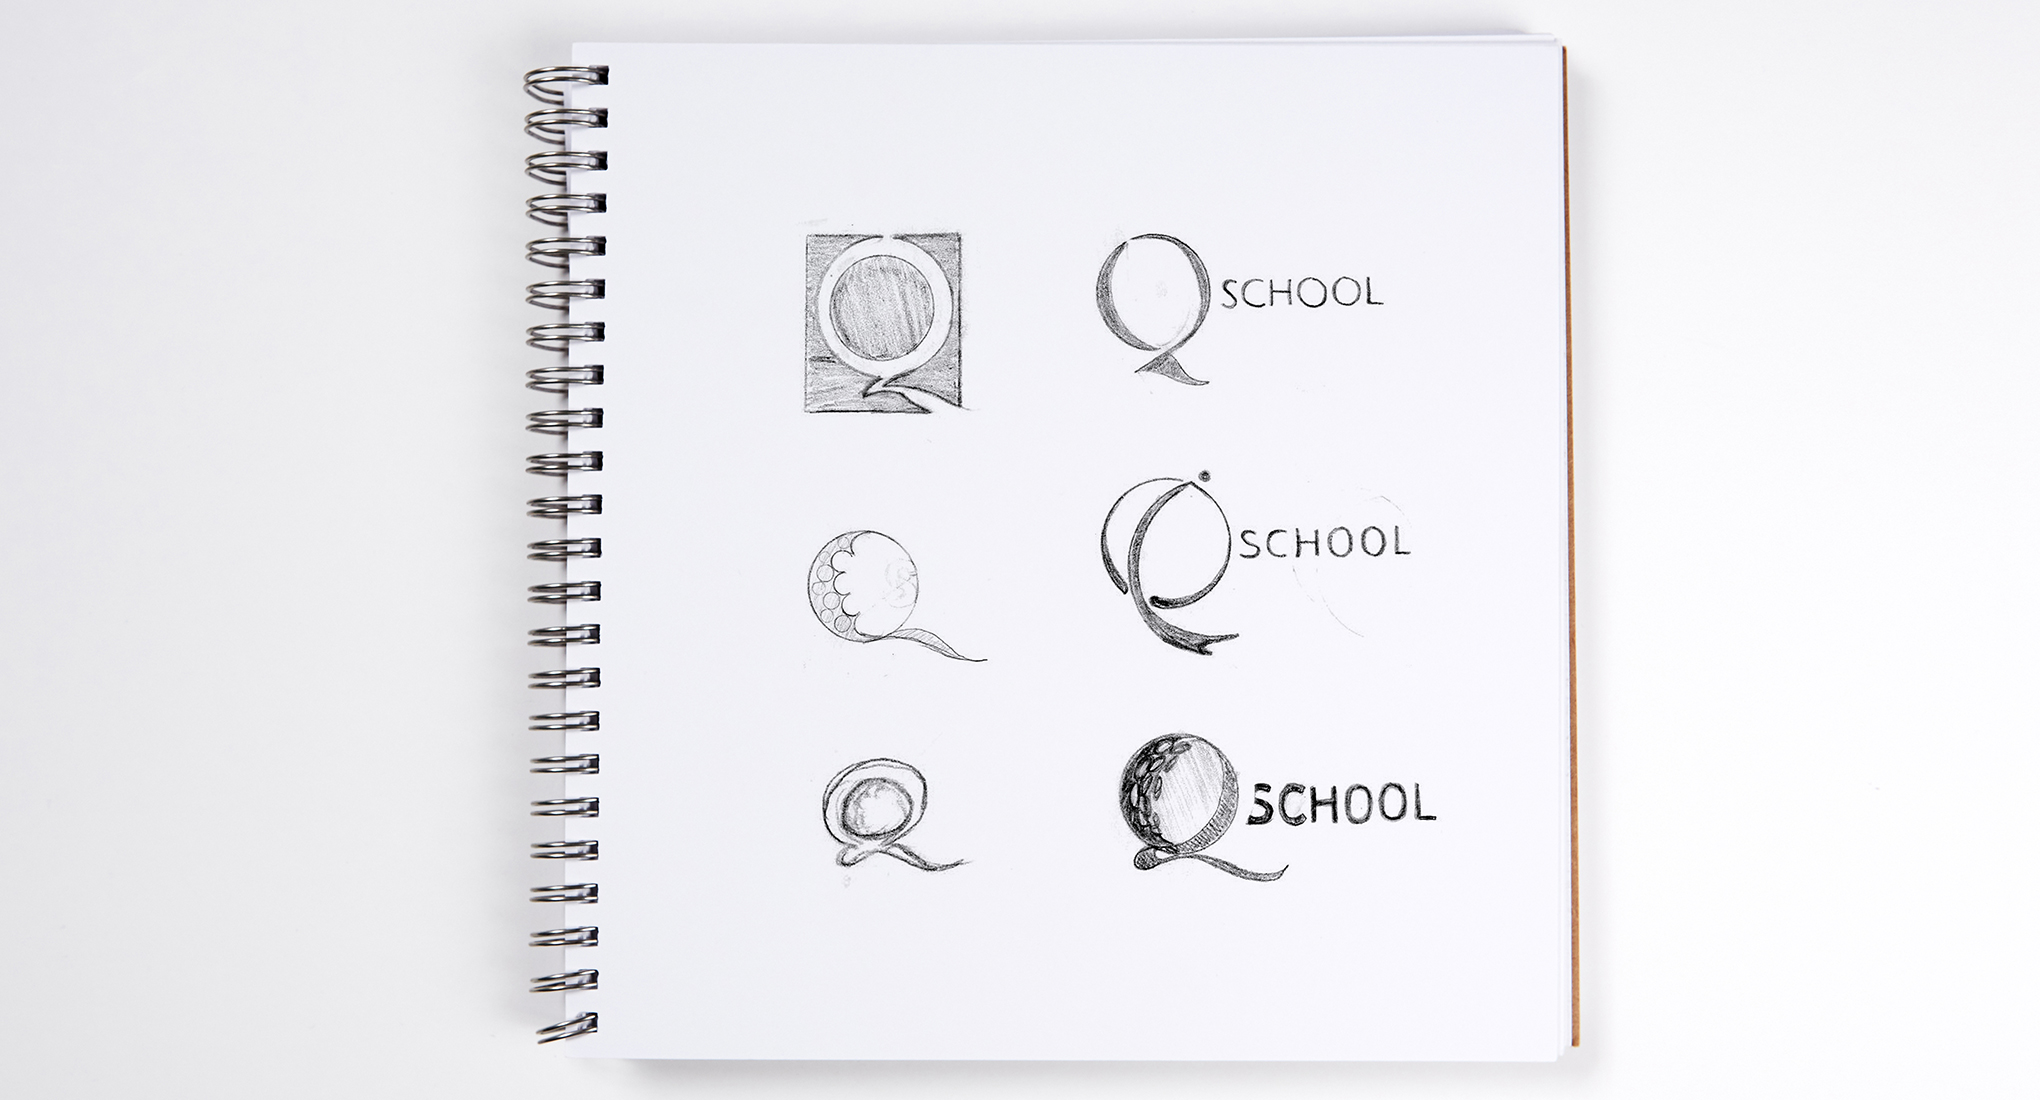 q-school-initial-sketches.jpg